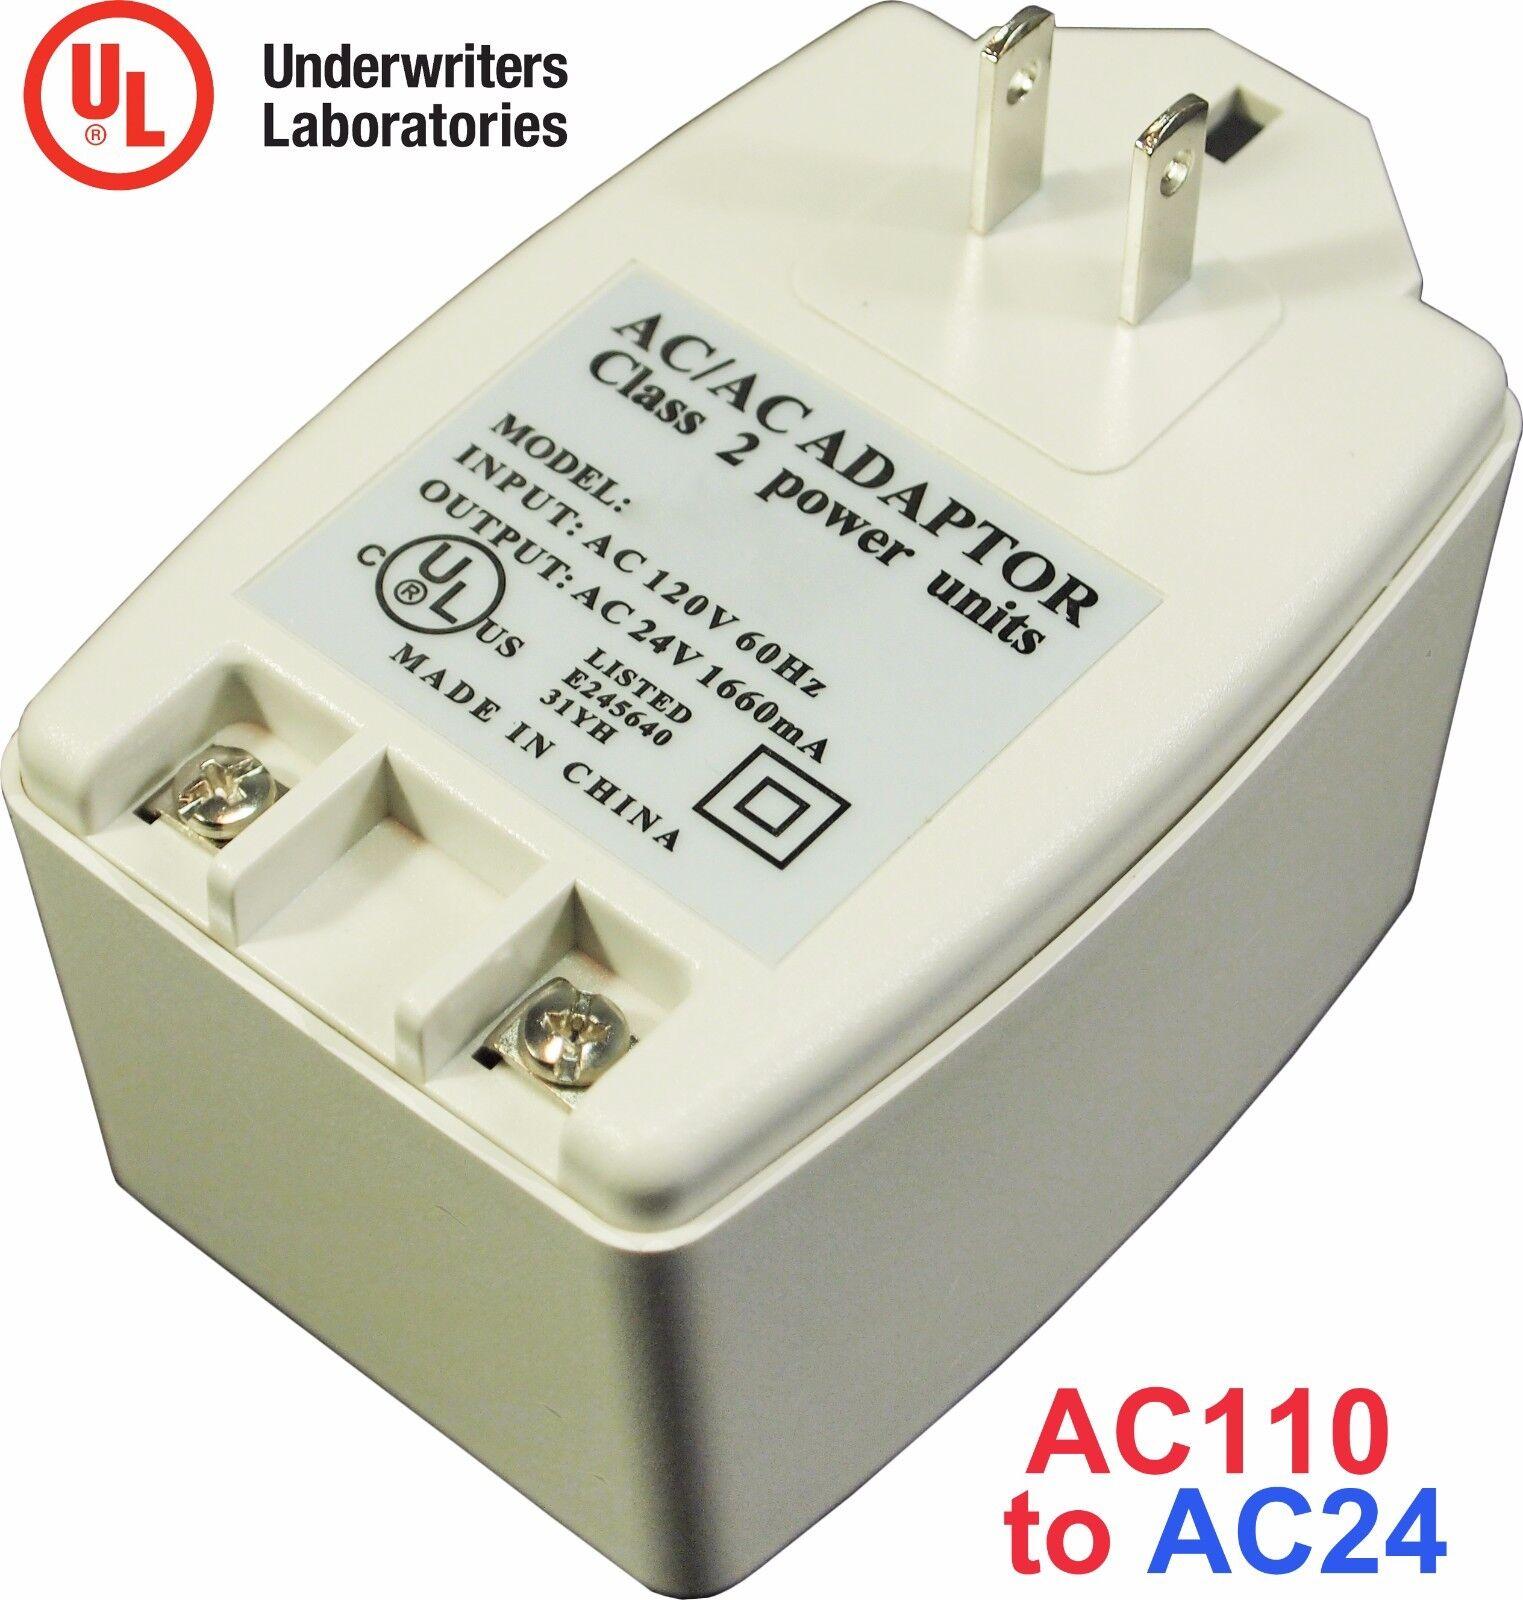 AC 24V 1660mA 40VA Transformer Adapter AC110V to AC24V Convert with UL Certified